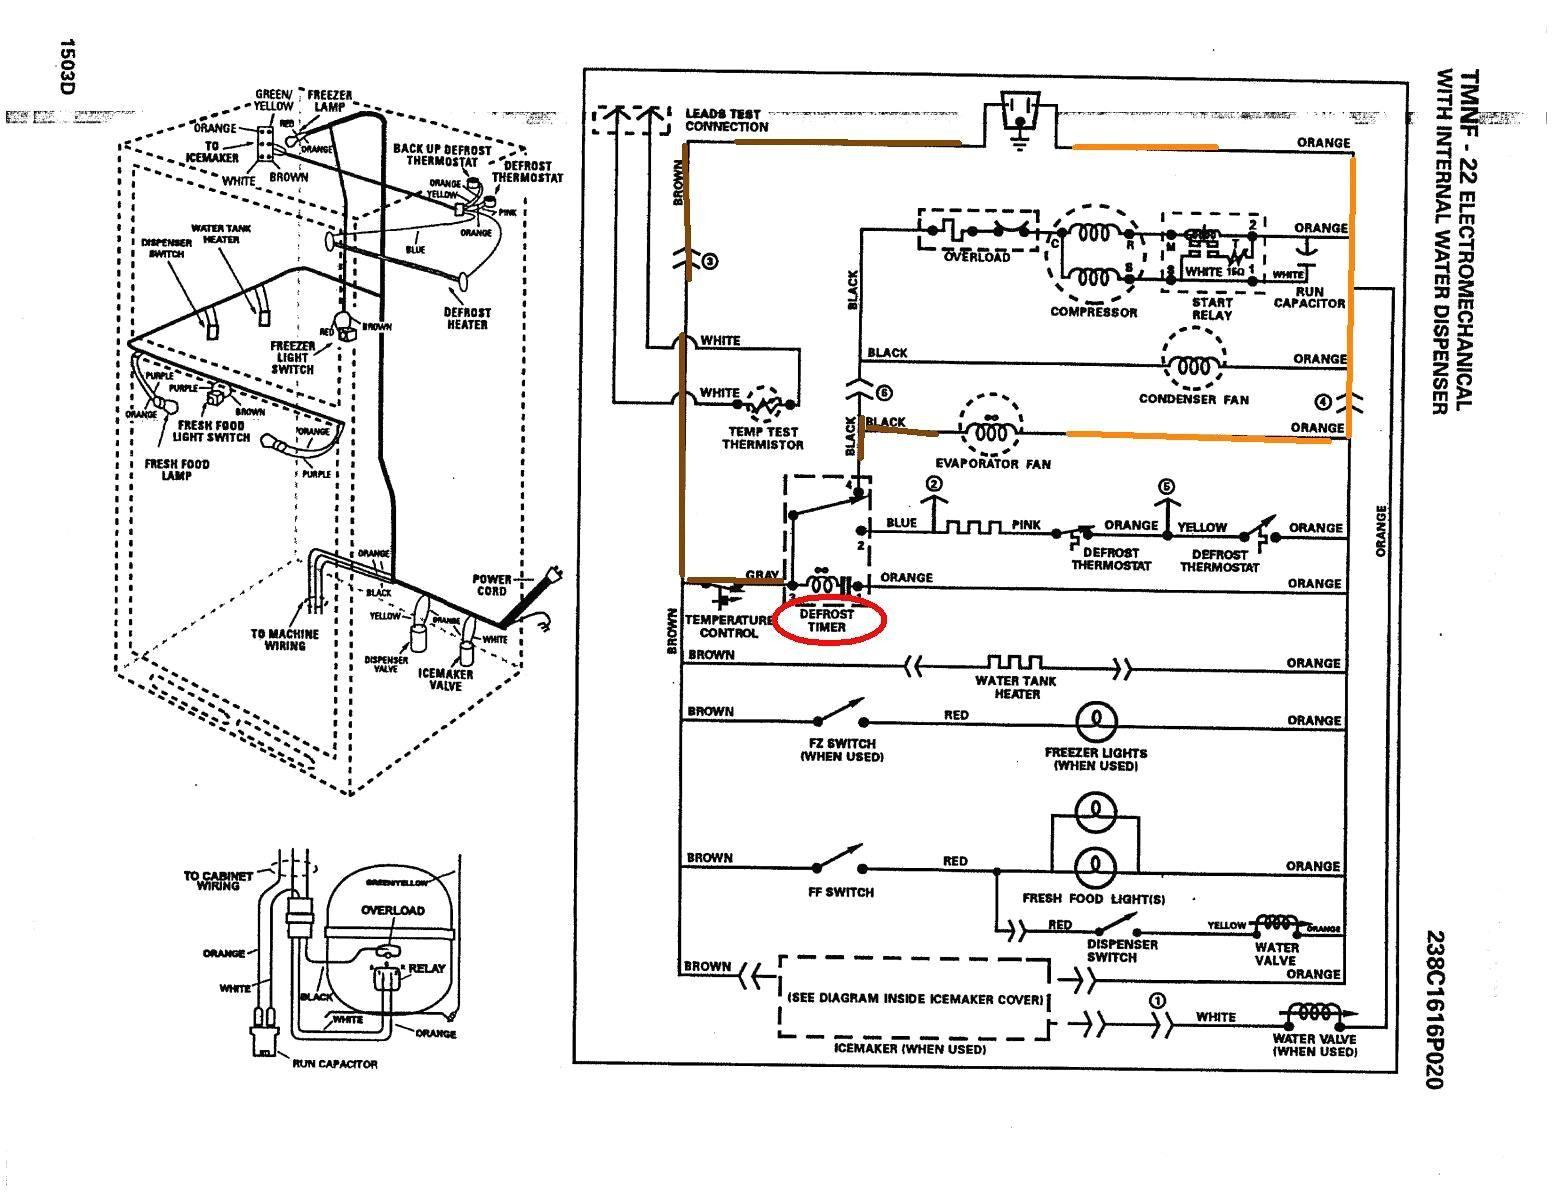 Panasonic Refrigerator Wiring Diagram | Wiring Diagram - Refrigerator Wiring Diagram